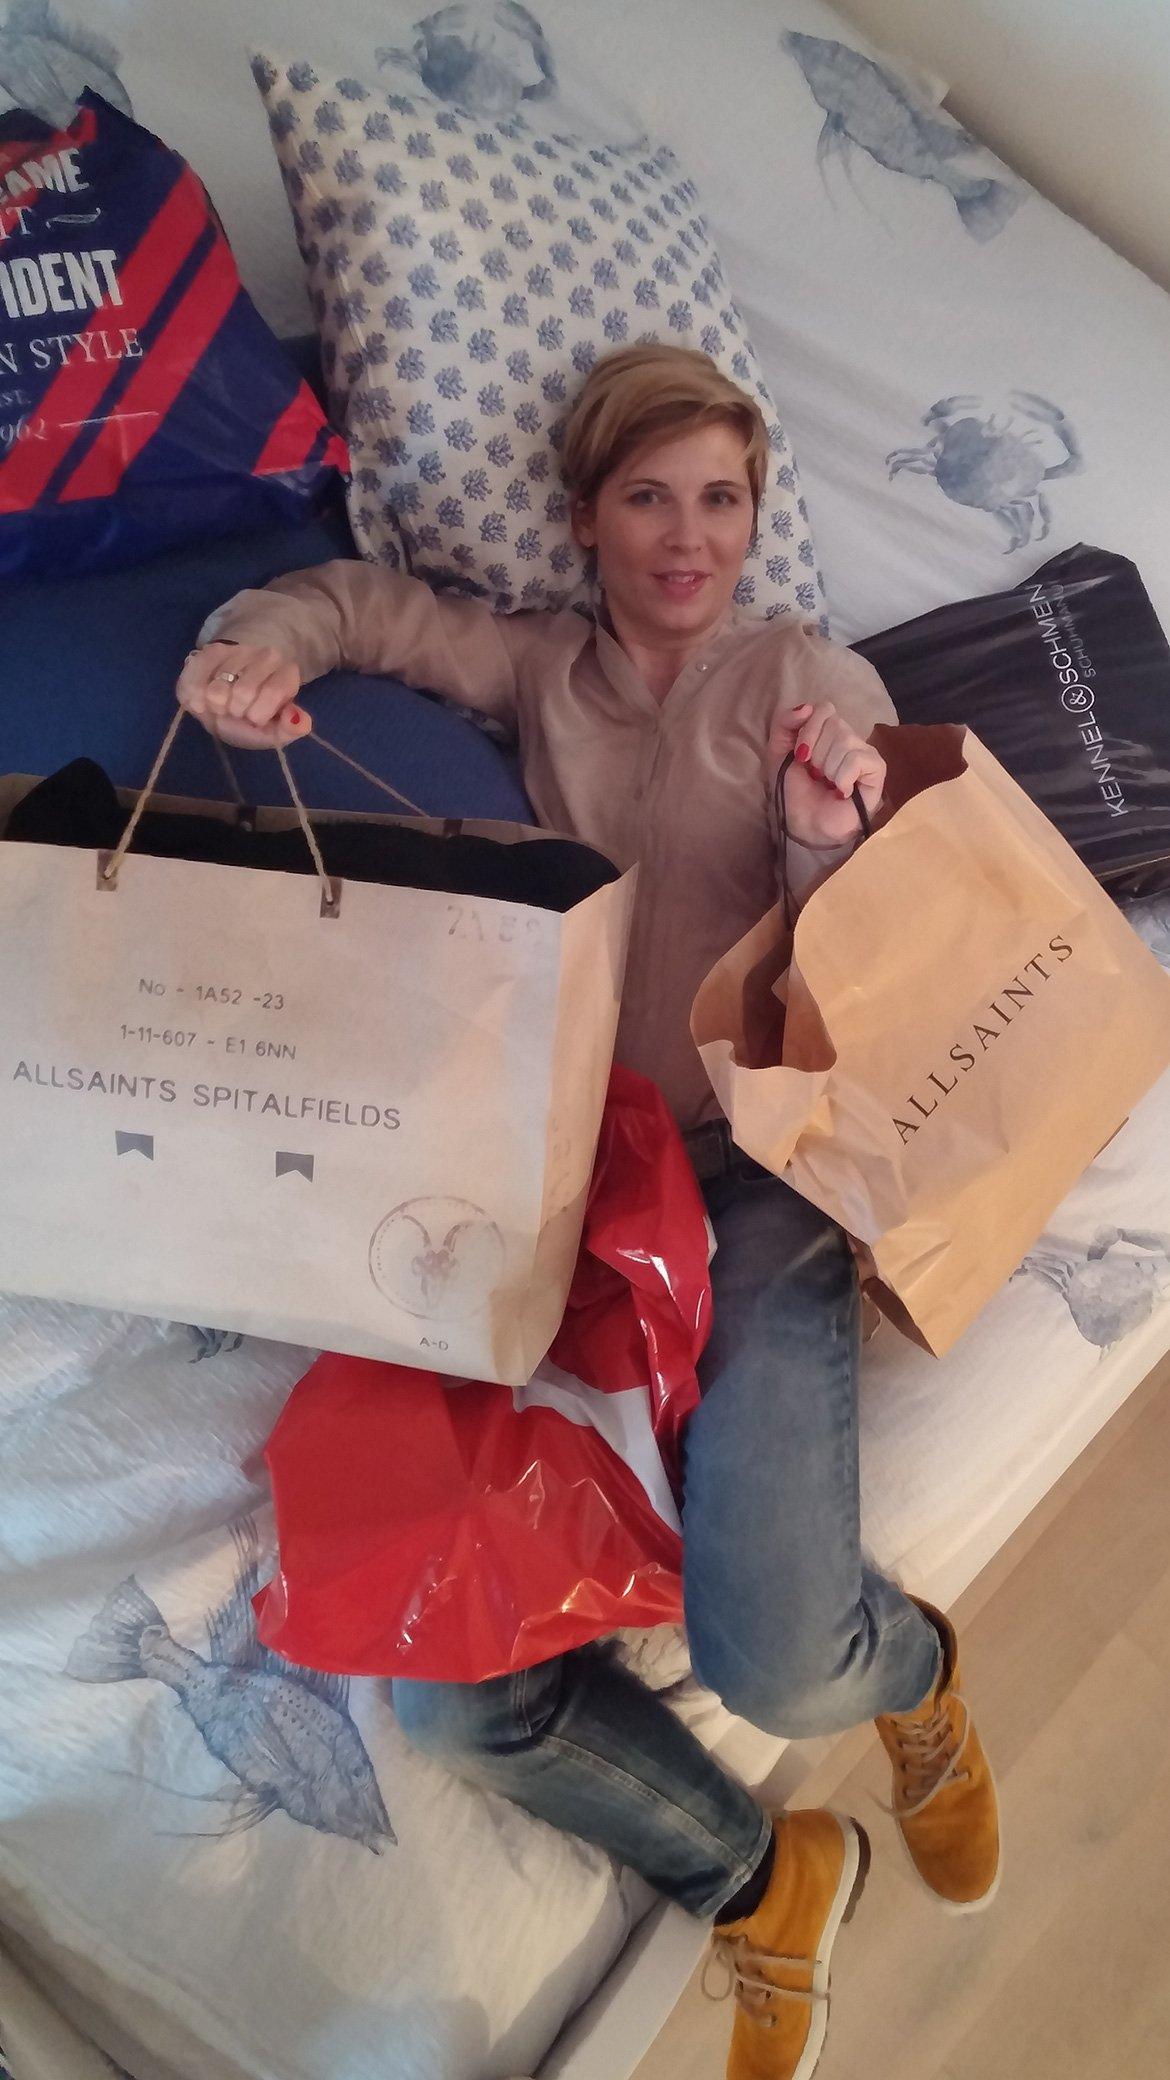 20151031 163630 shoppingausbeute im bett styleoutlet. Black Bedroom Furniture Sets. Home Design Ideas